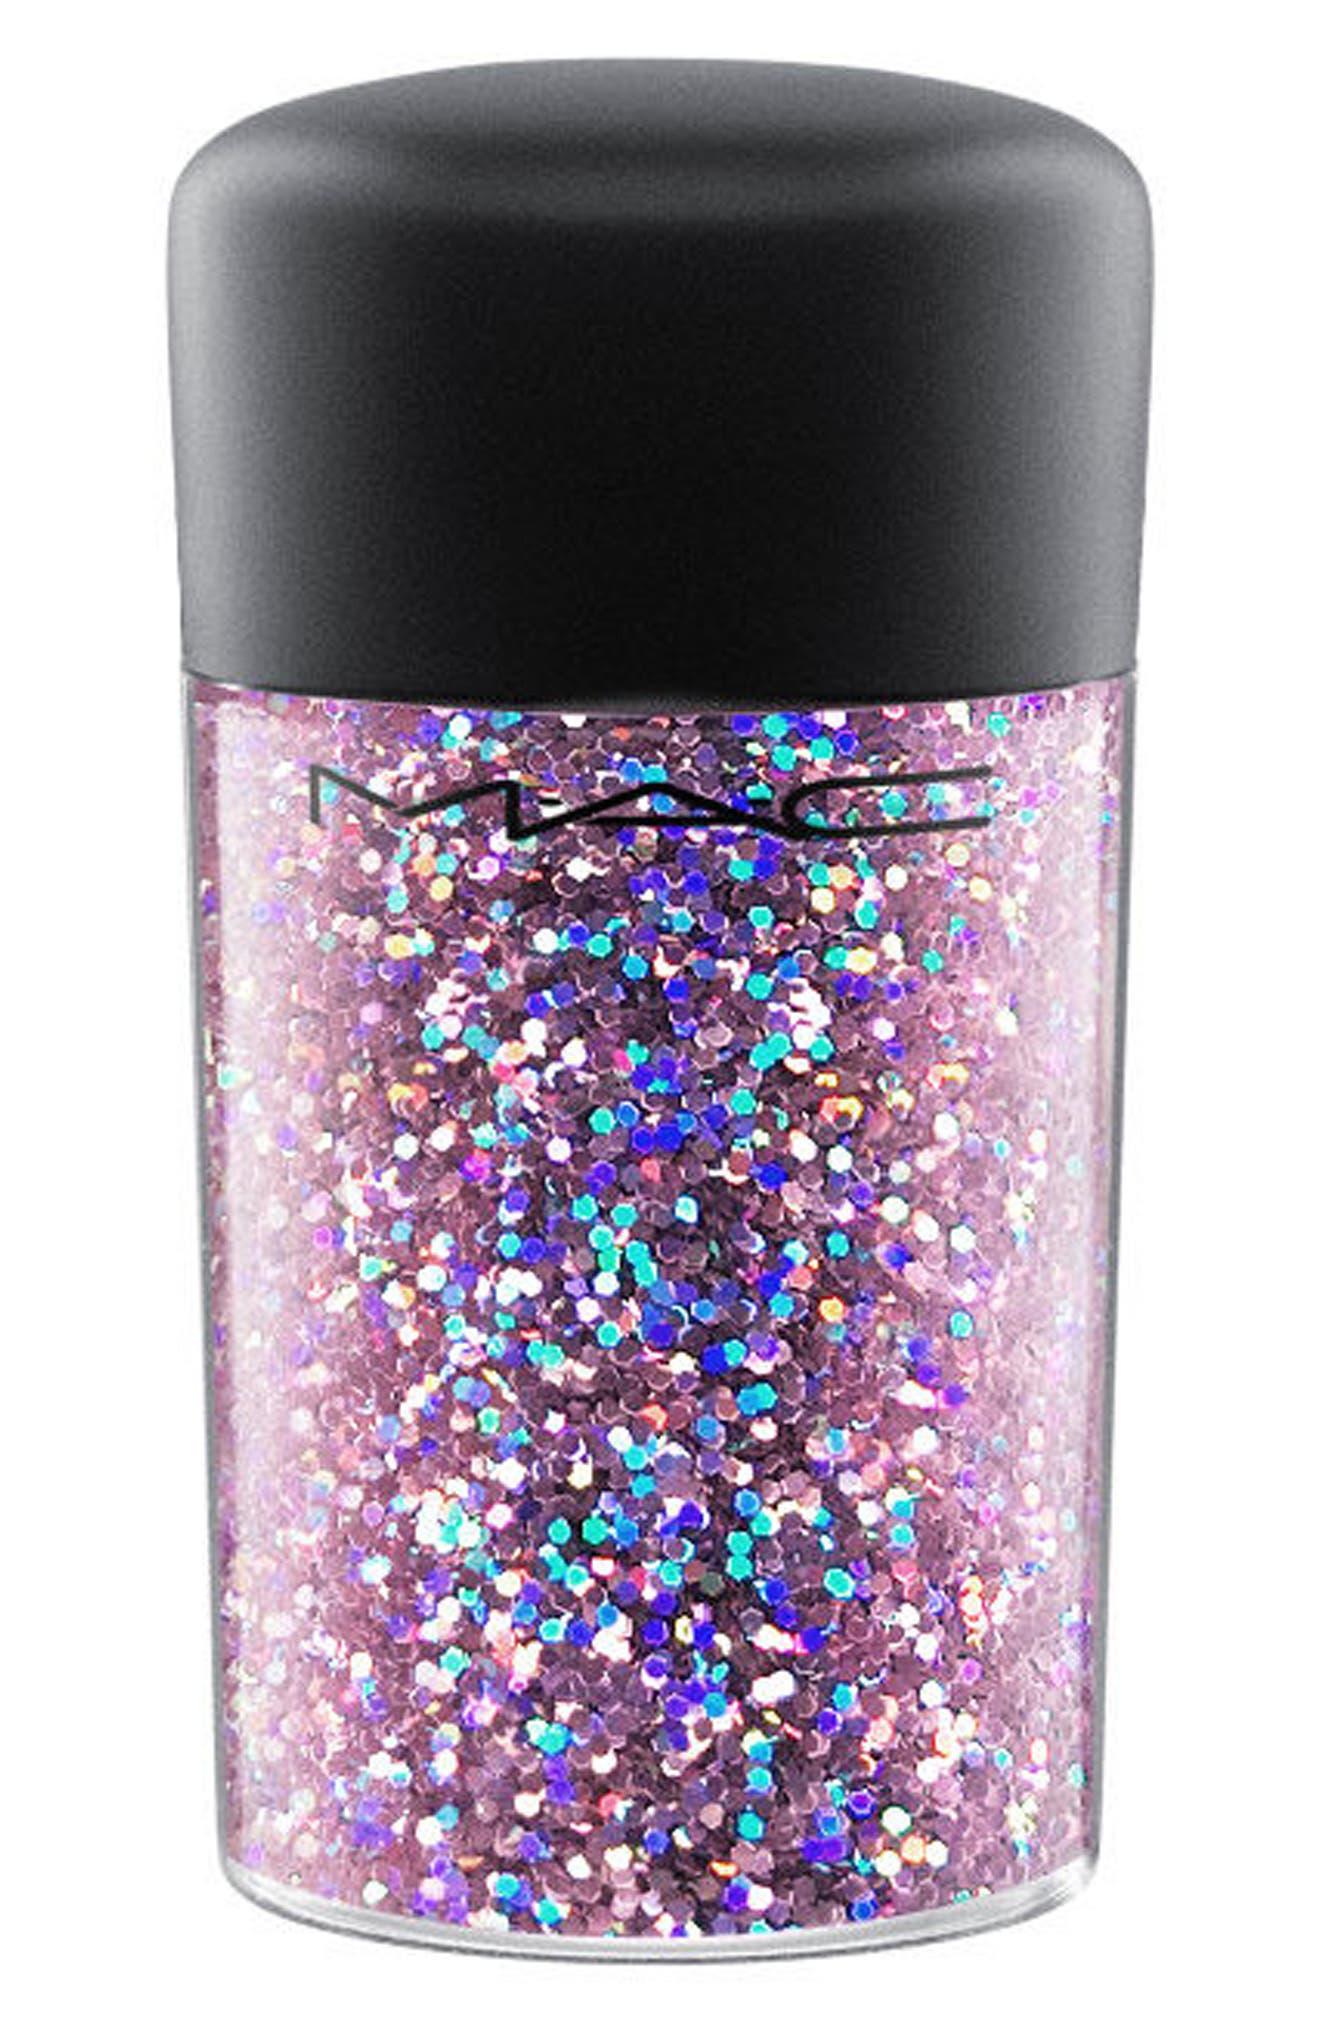 Image of MAC Cosmetics Glitter